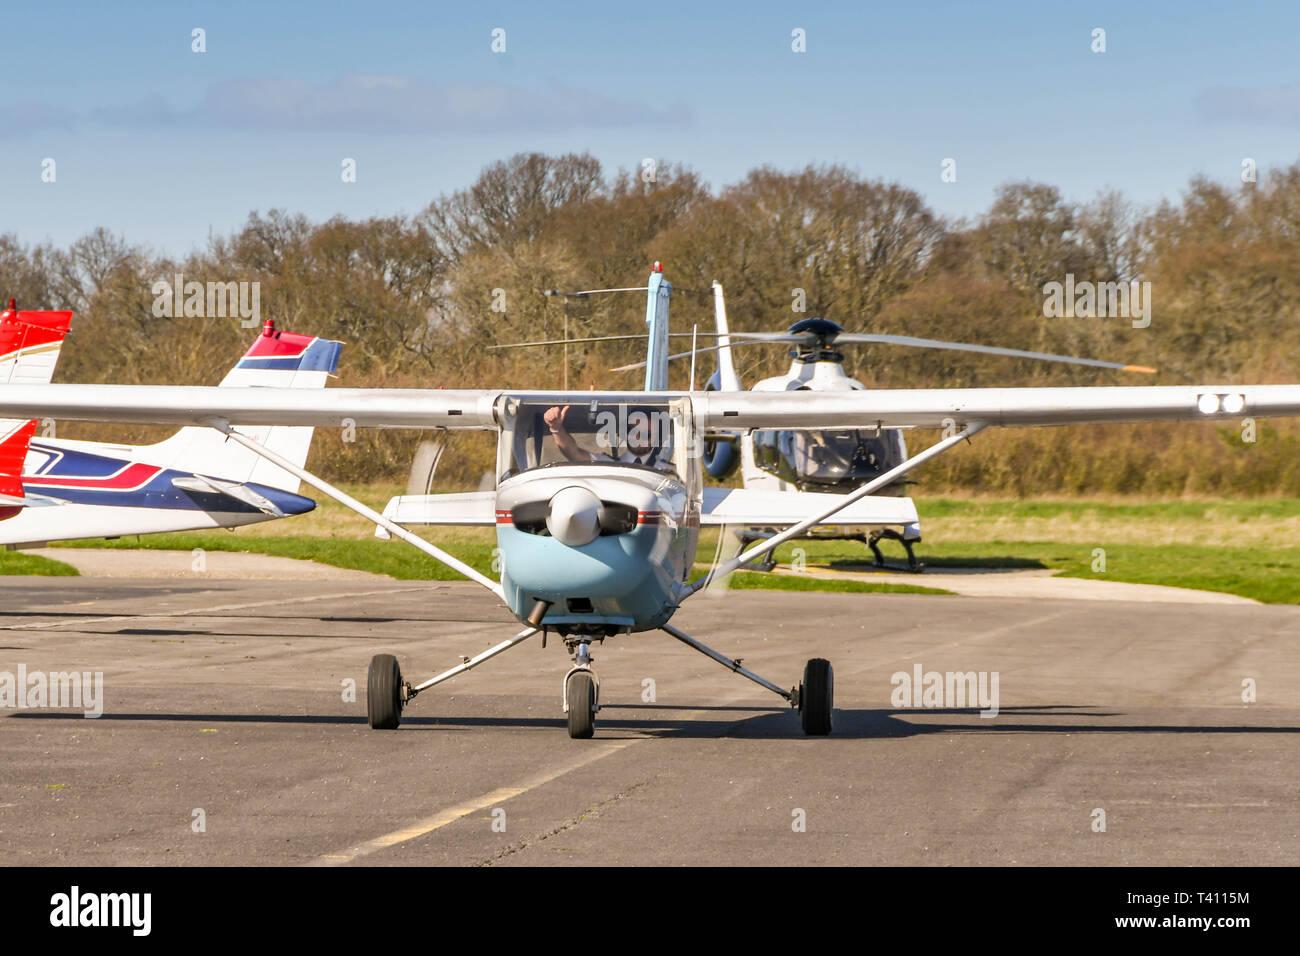 HIGH WYCOMBE, Inghilterra - Marzo 2019: Cessna luce Aerobat trainer aerei con pilota dando un pollice in alto segno a Wycombe Air Park. Foto Stock